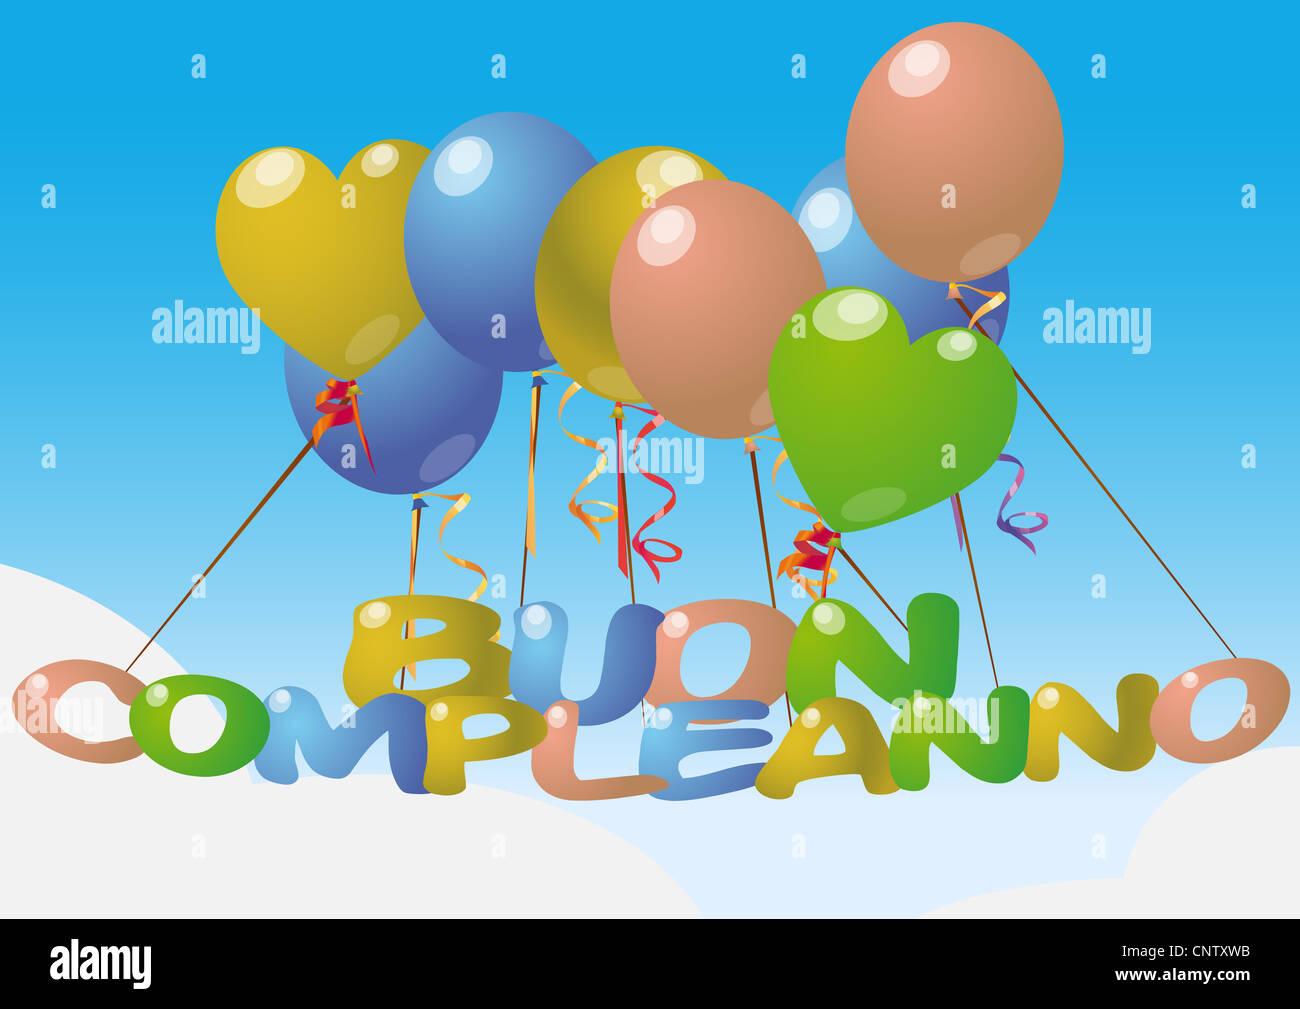 Illustration Of Happy Birthday In Italian Language Stock Photo Alamy